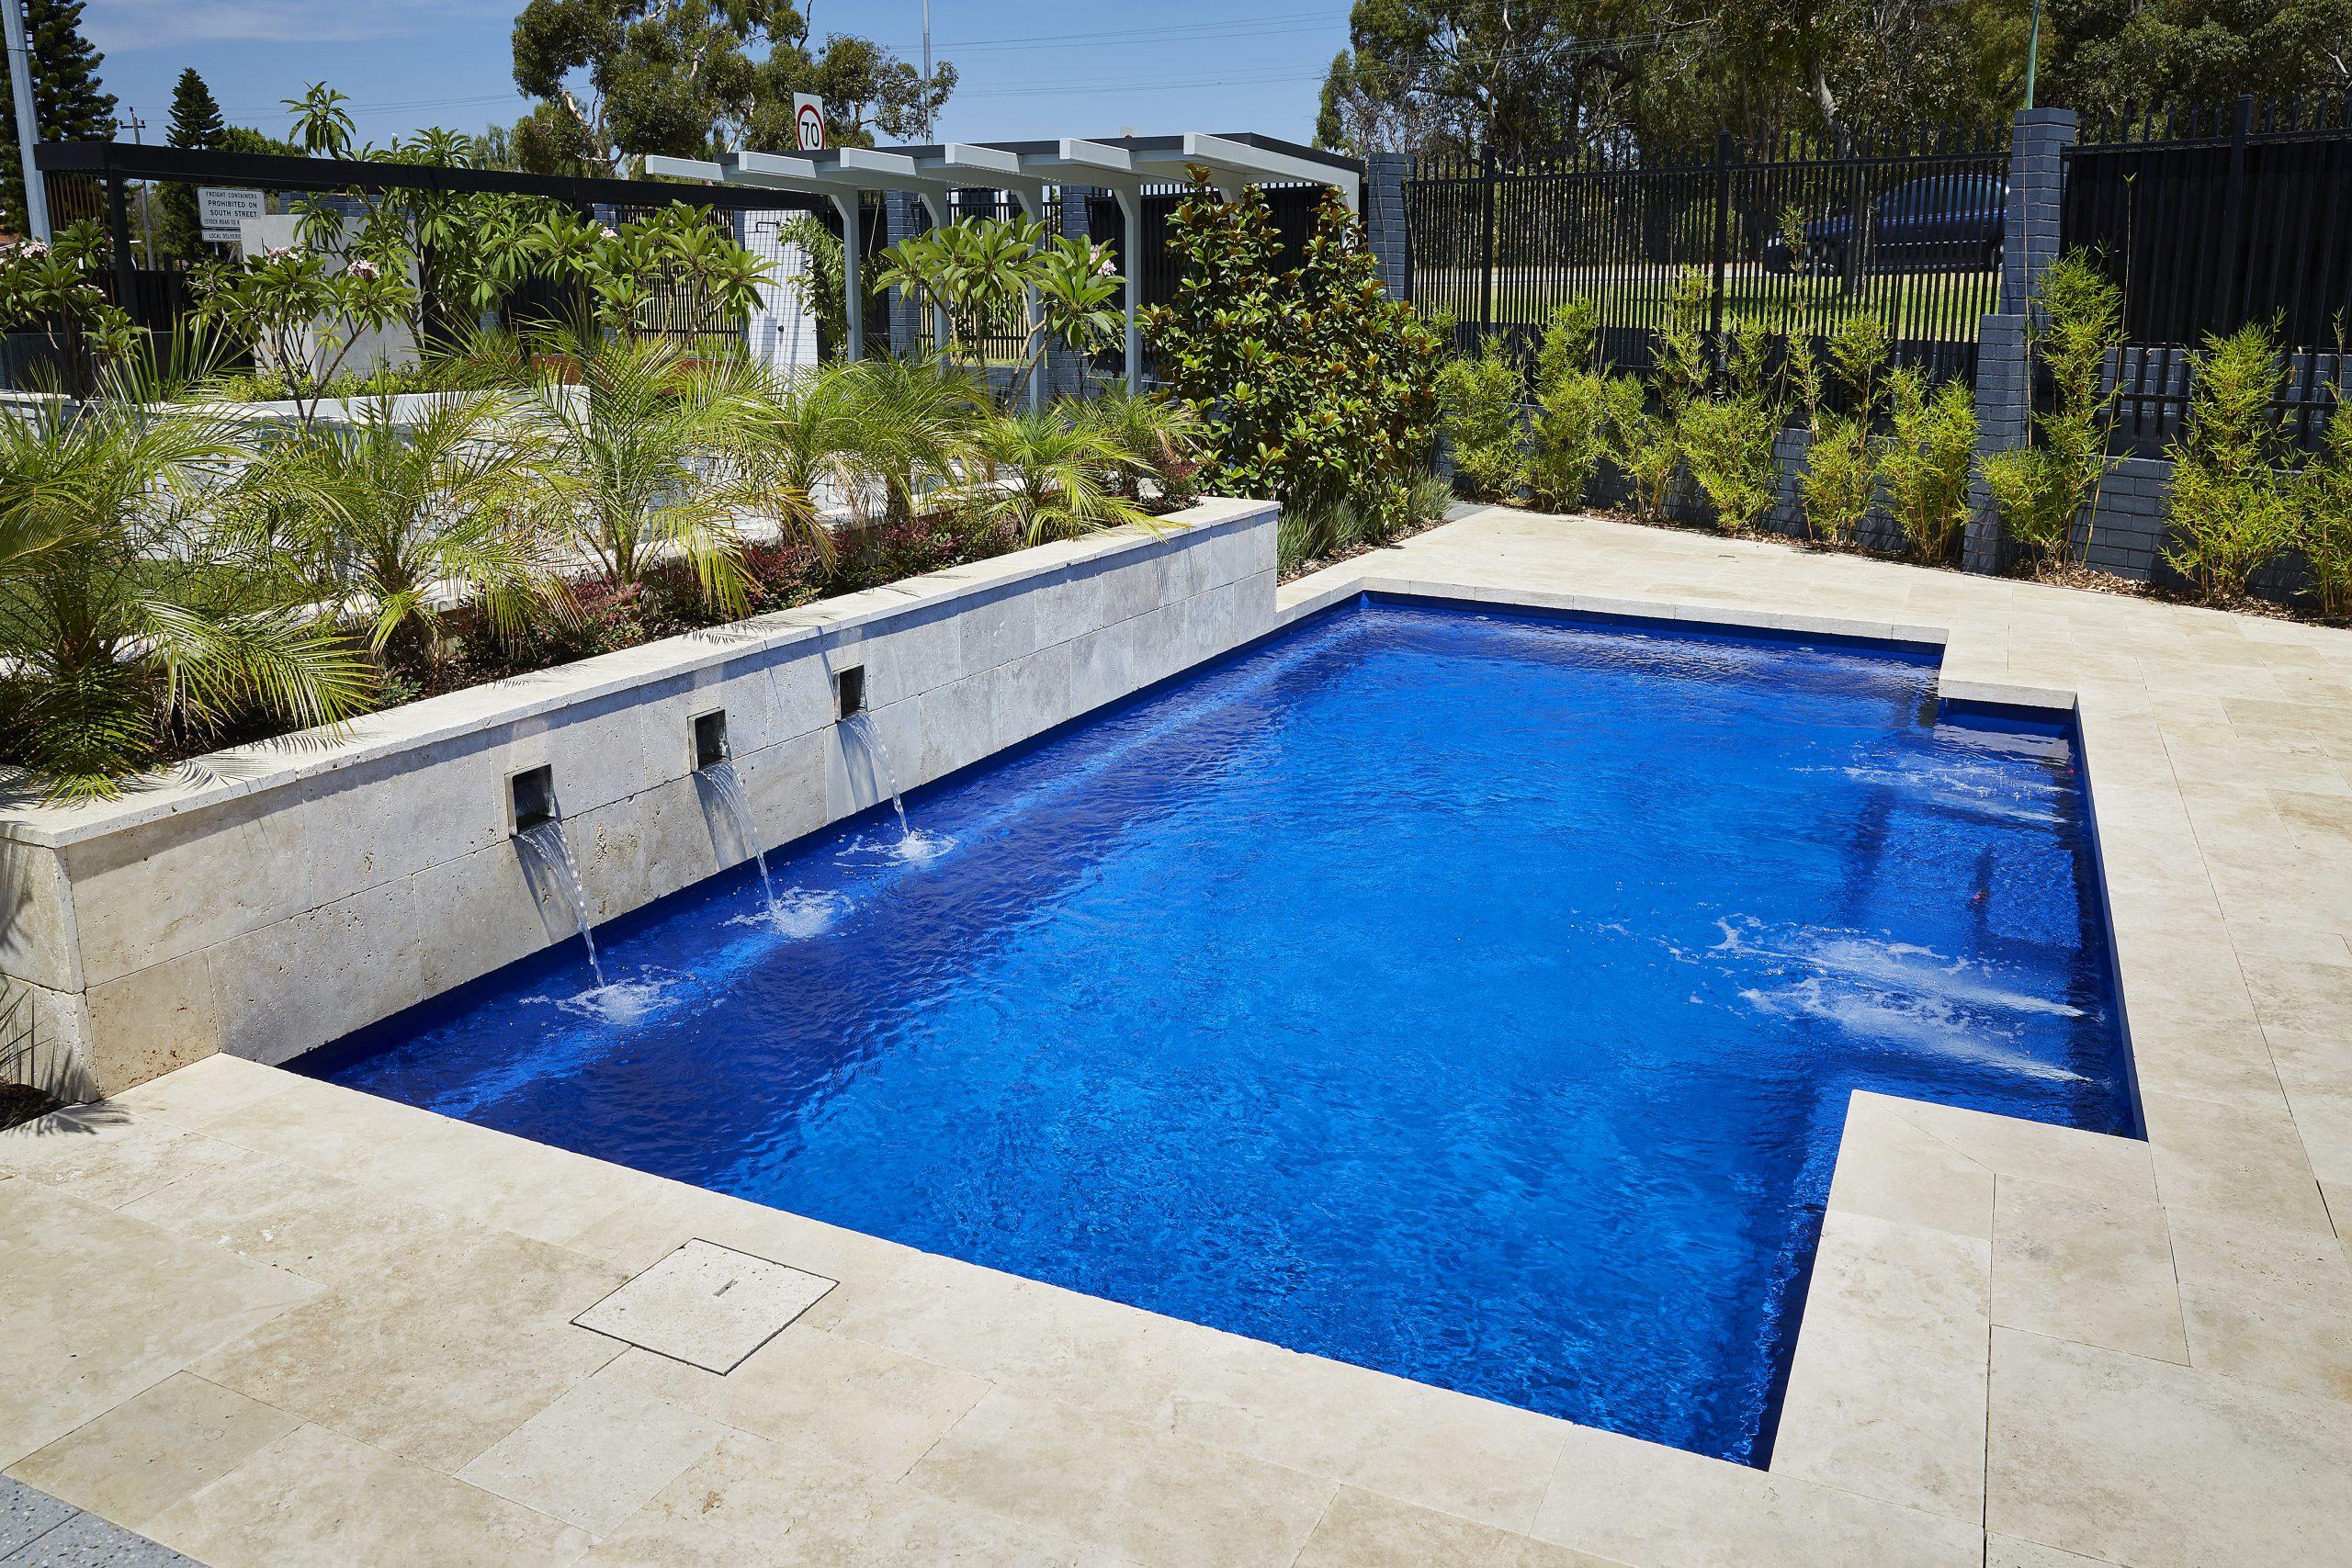 mineral pool royal blue